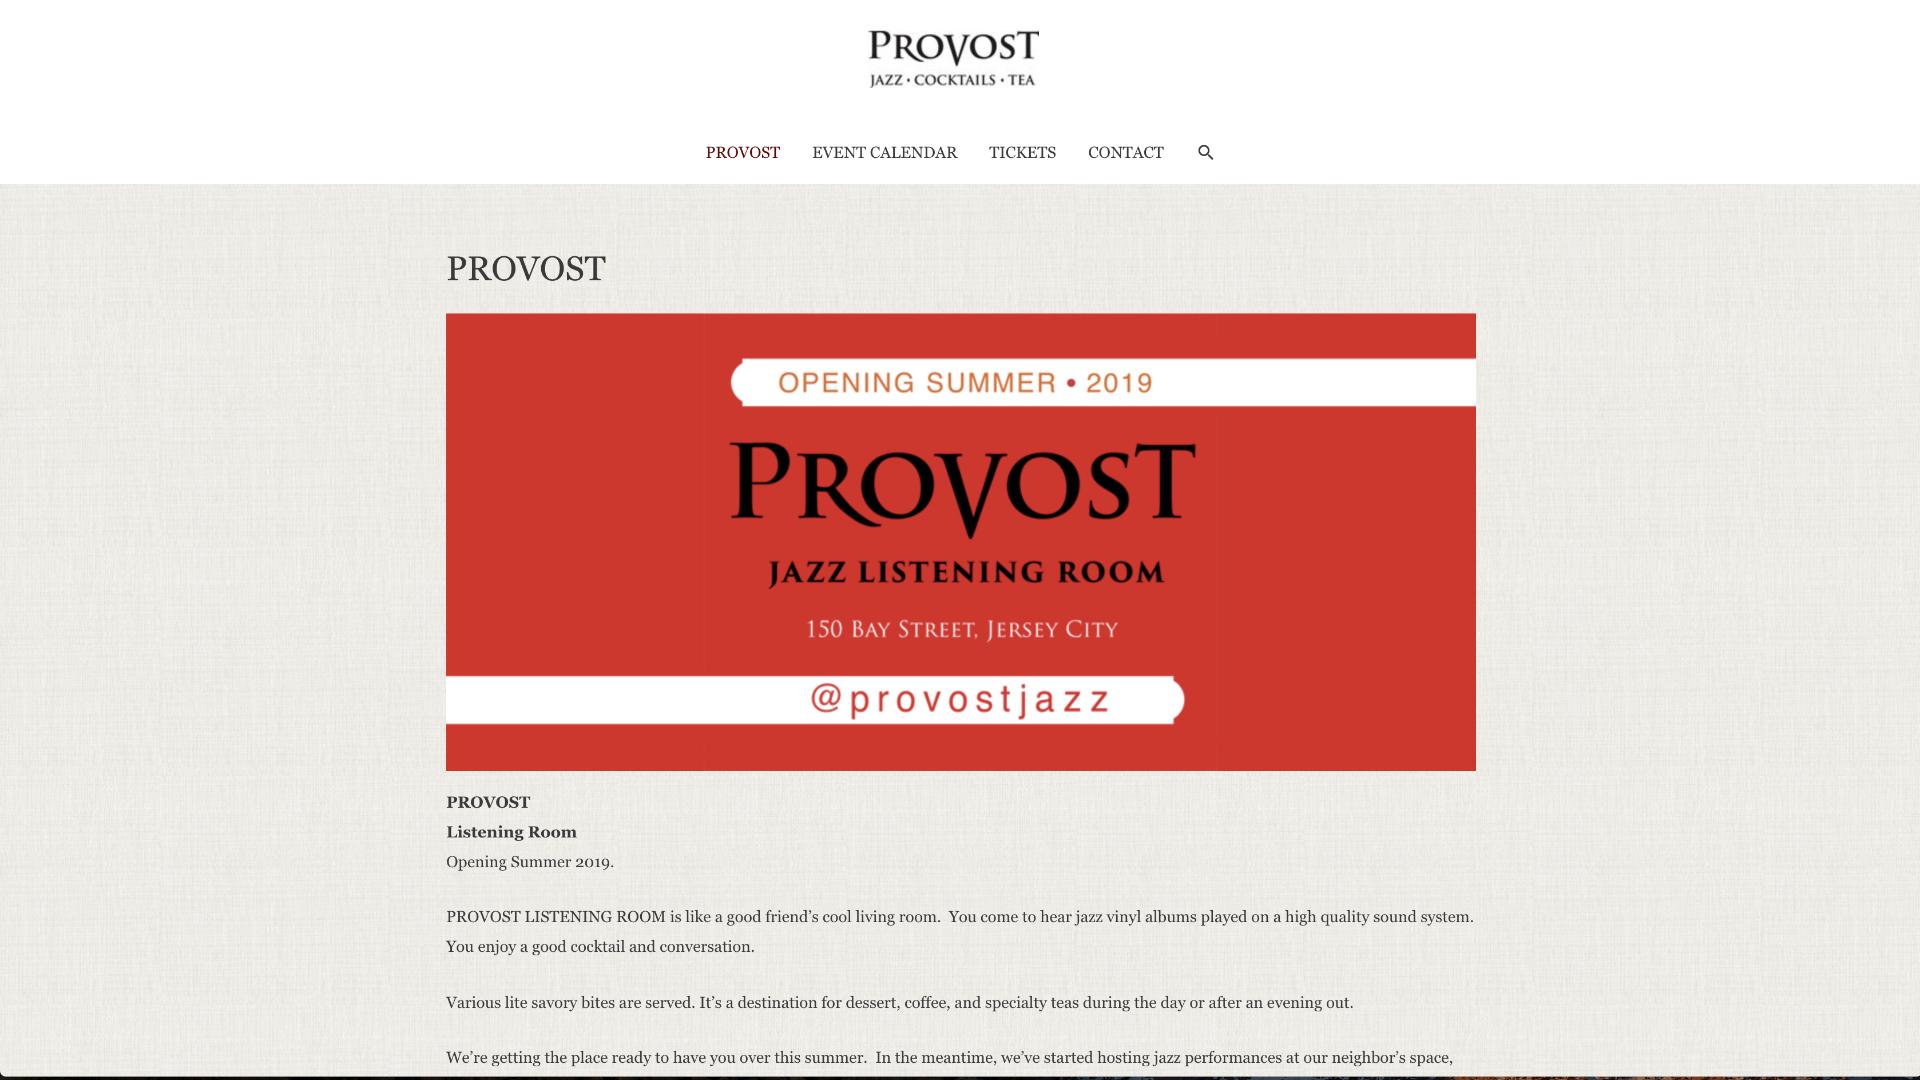 http://provostjazz.com/